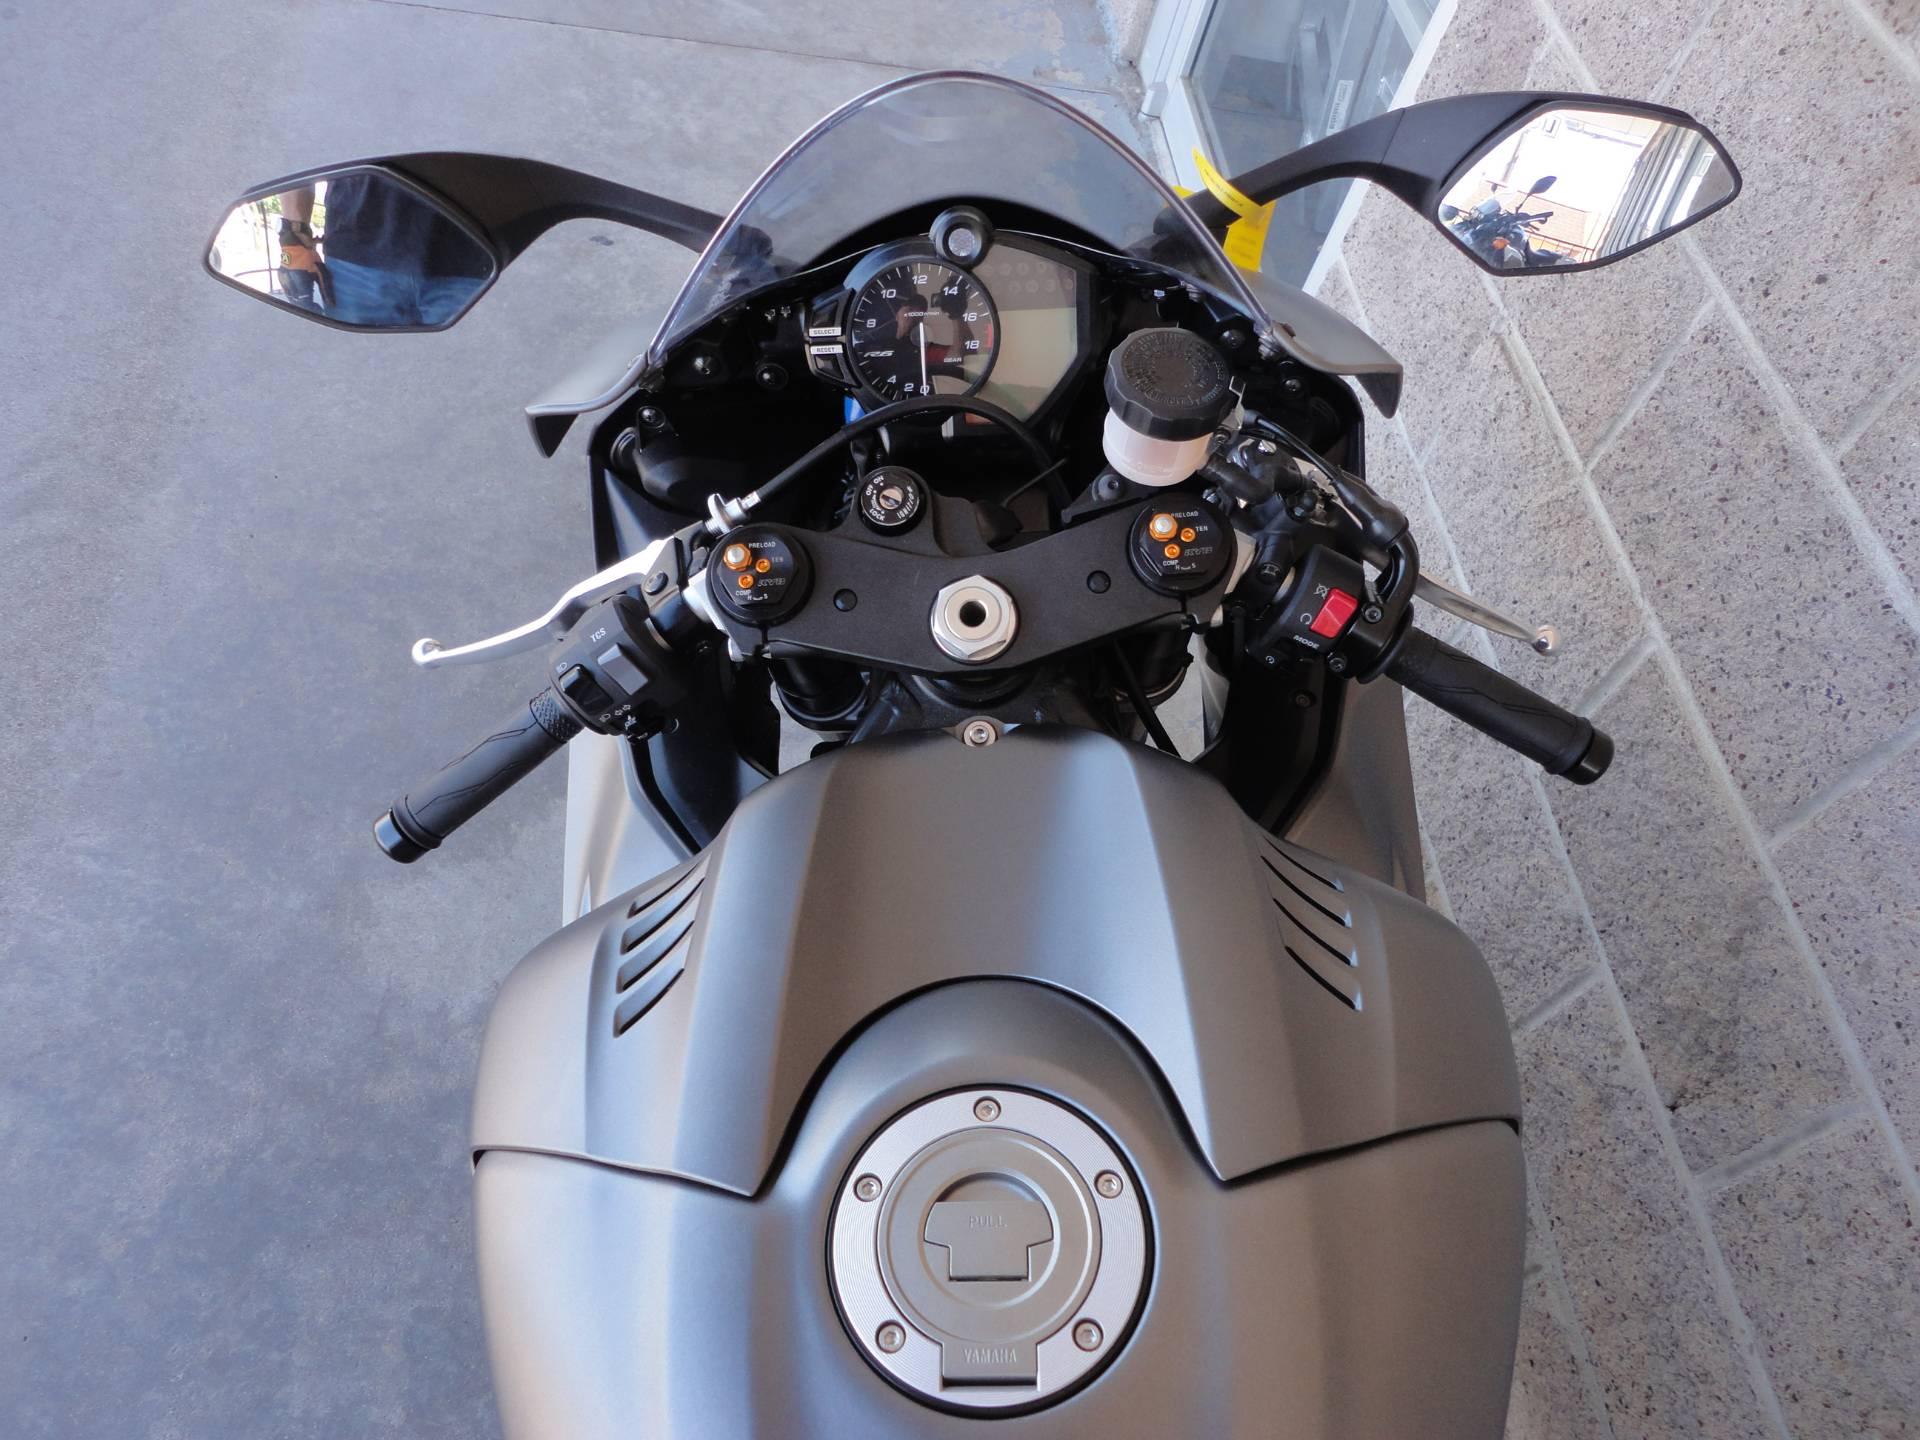 2019 Yamaha YZF-R6 9